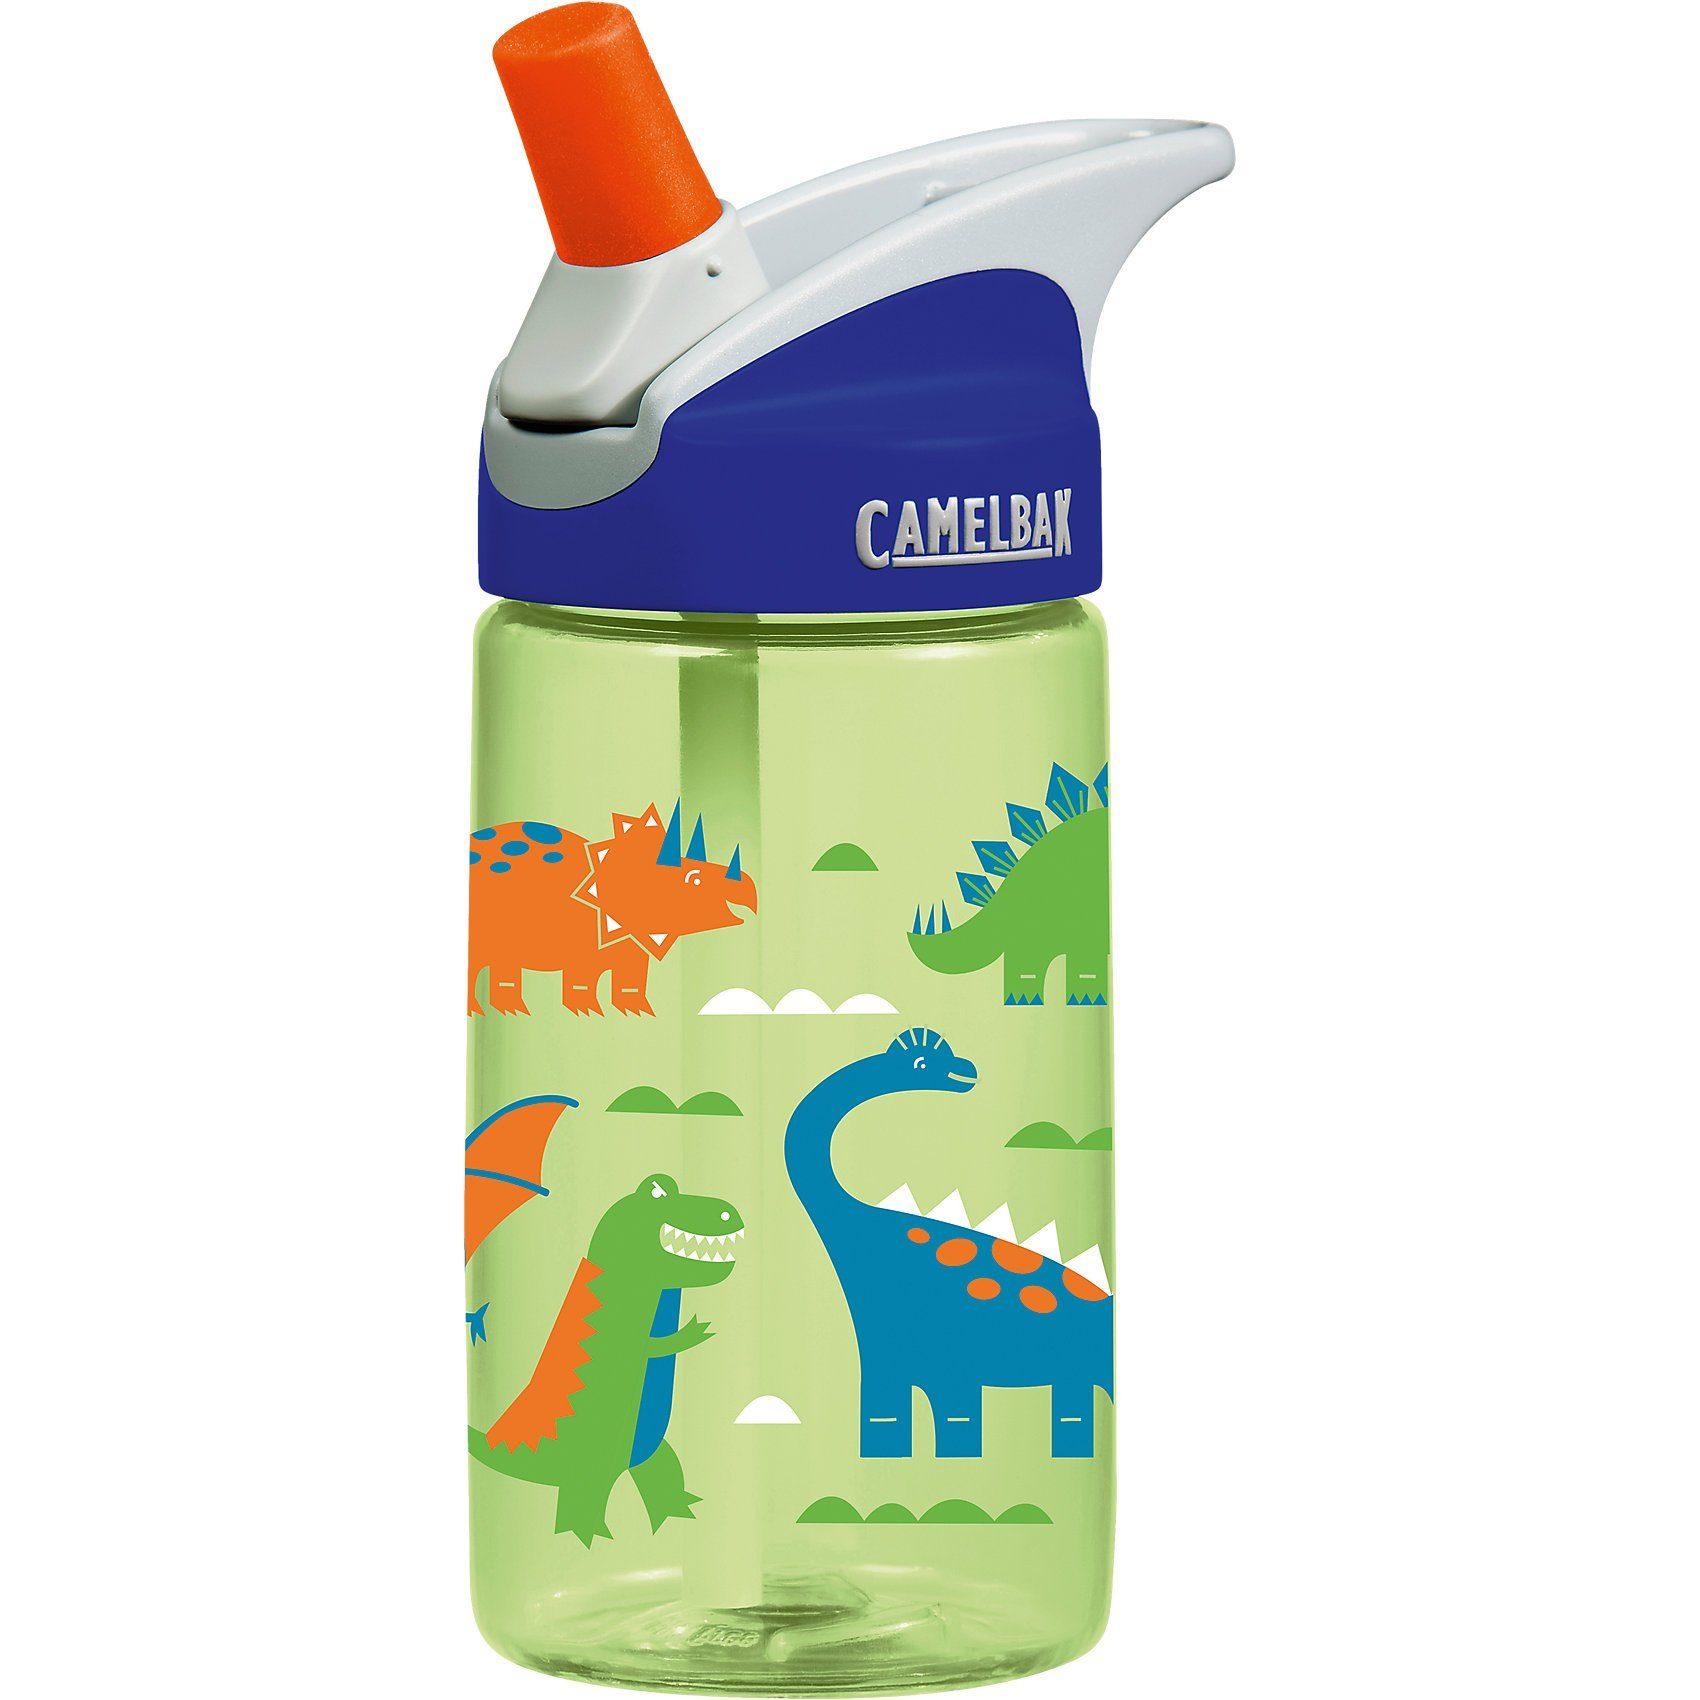 Camelbak Trinkflasche EDDY KIDS Dino Land, 400 ml